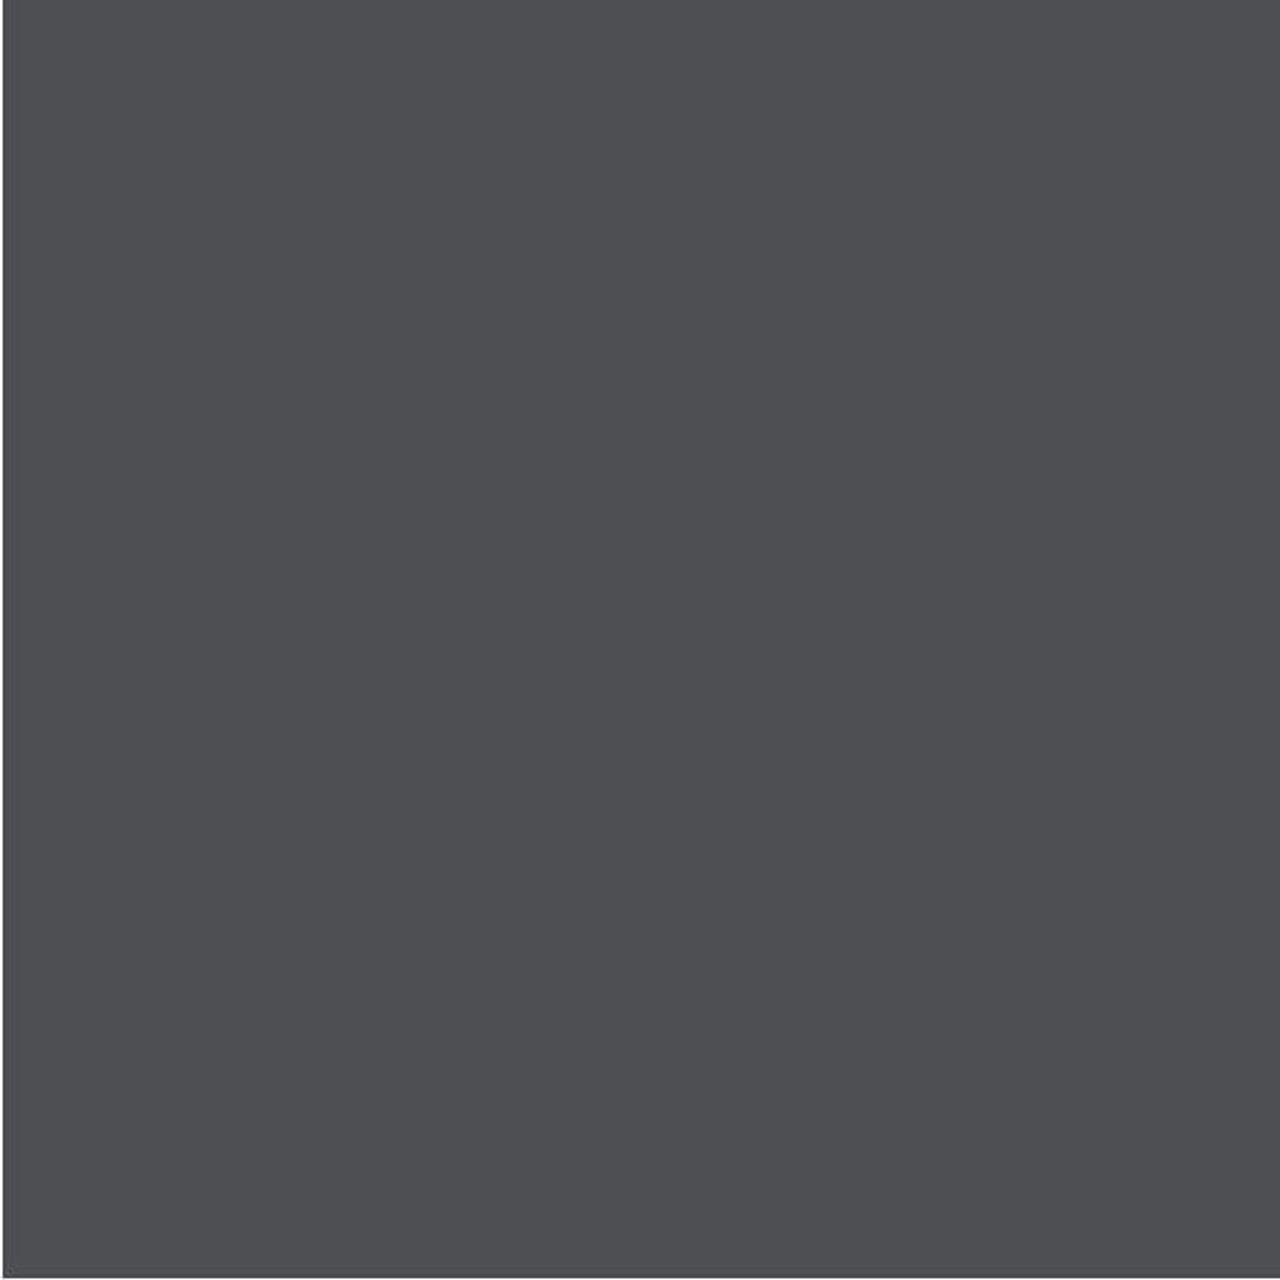 Fundermax, Standardfarbe, Carbongrau